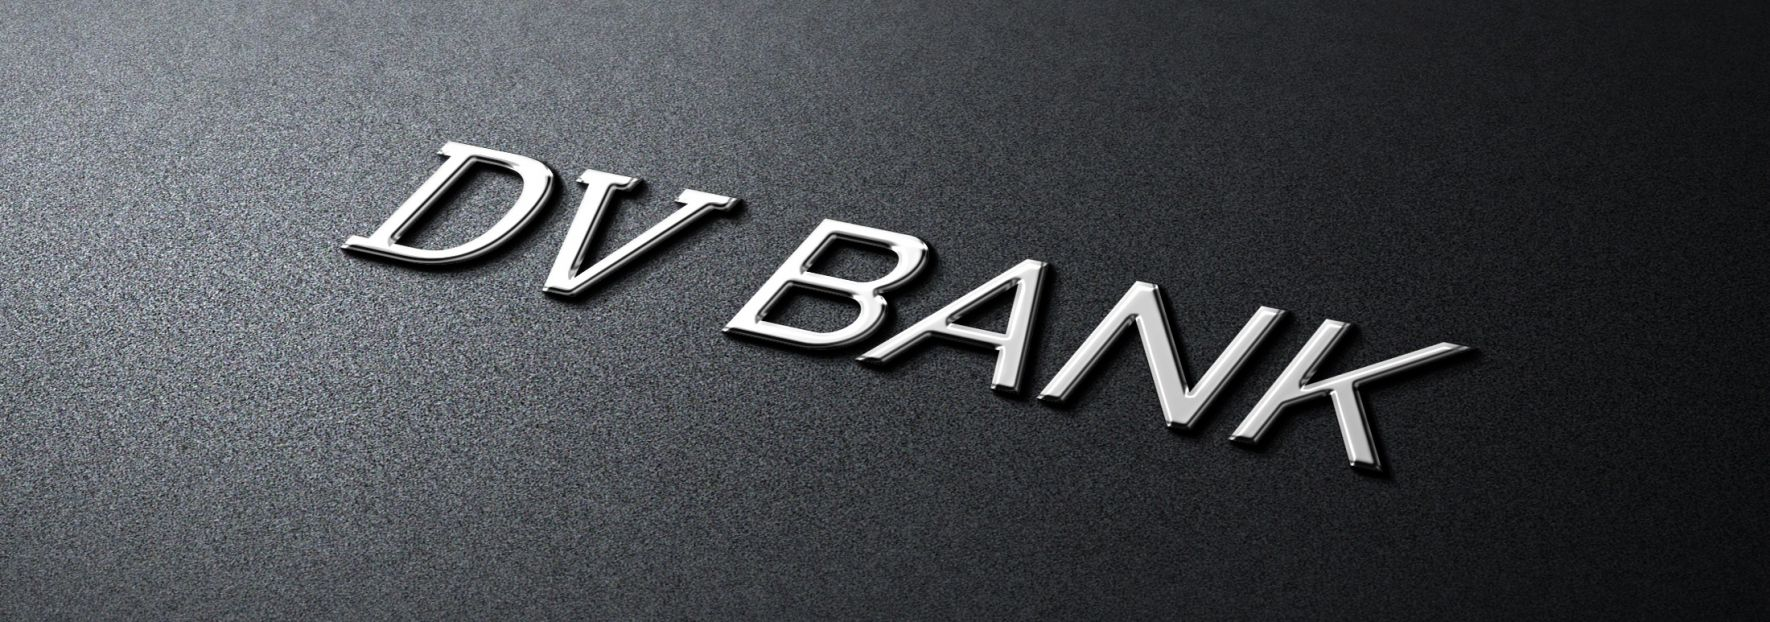 DV Bank остался без лицензий